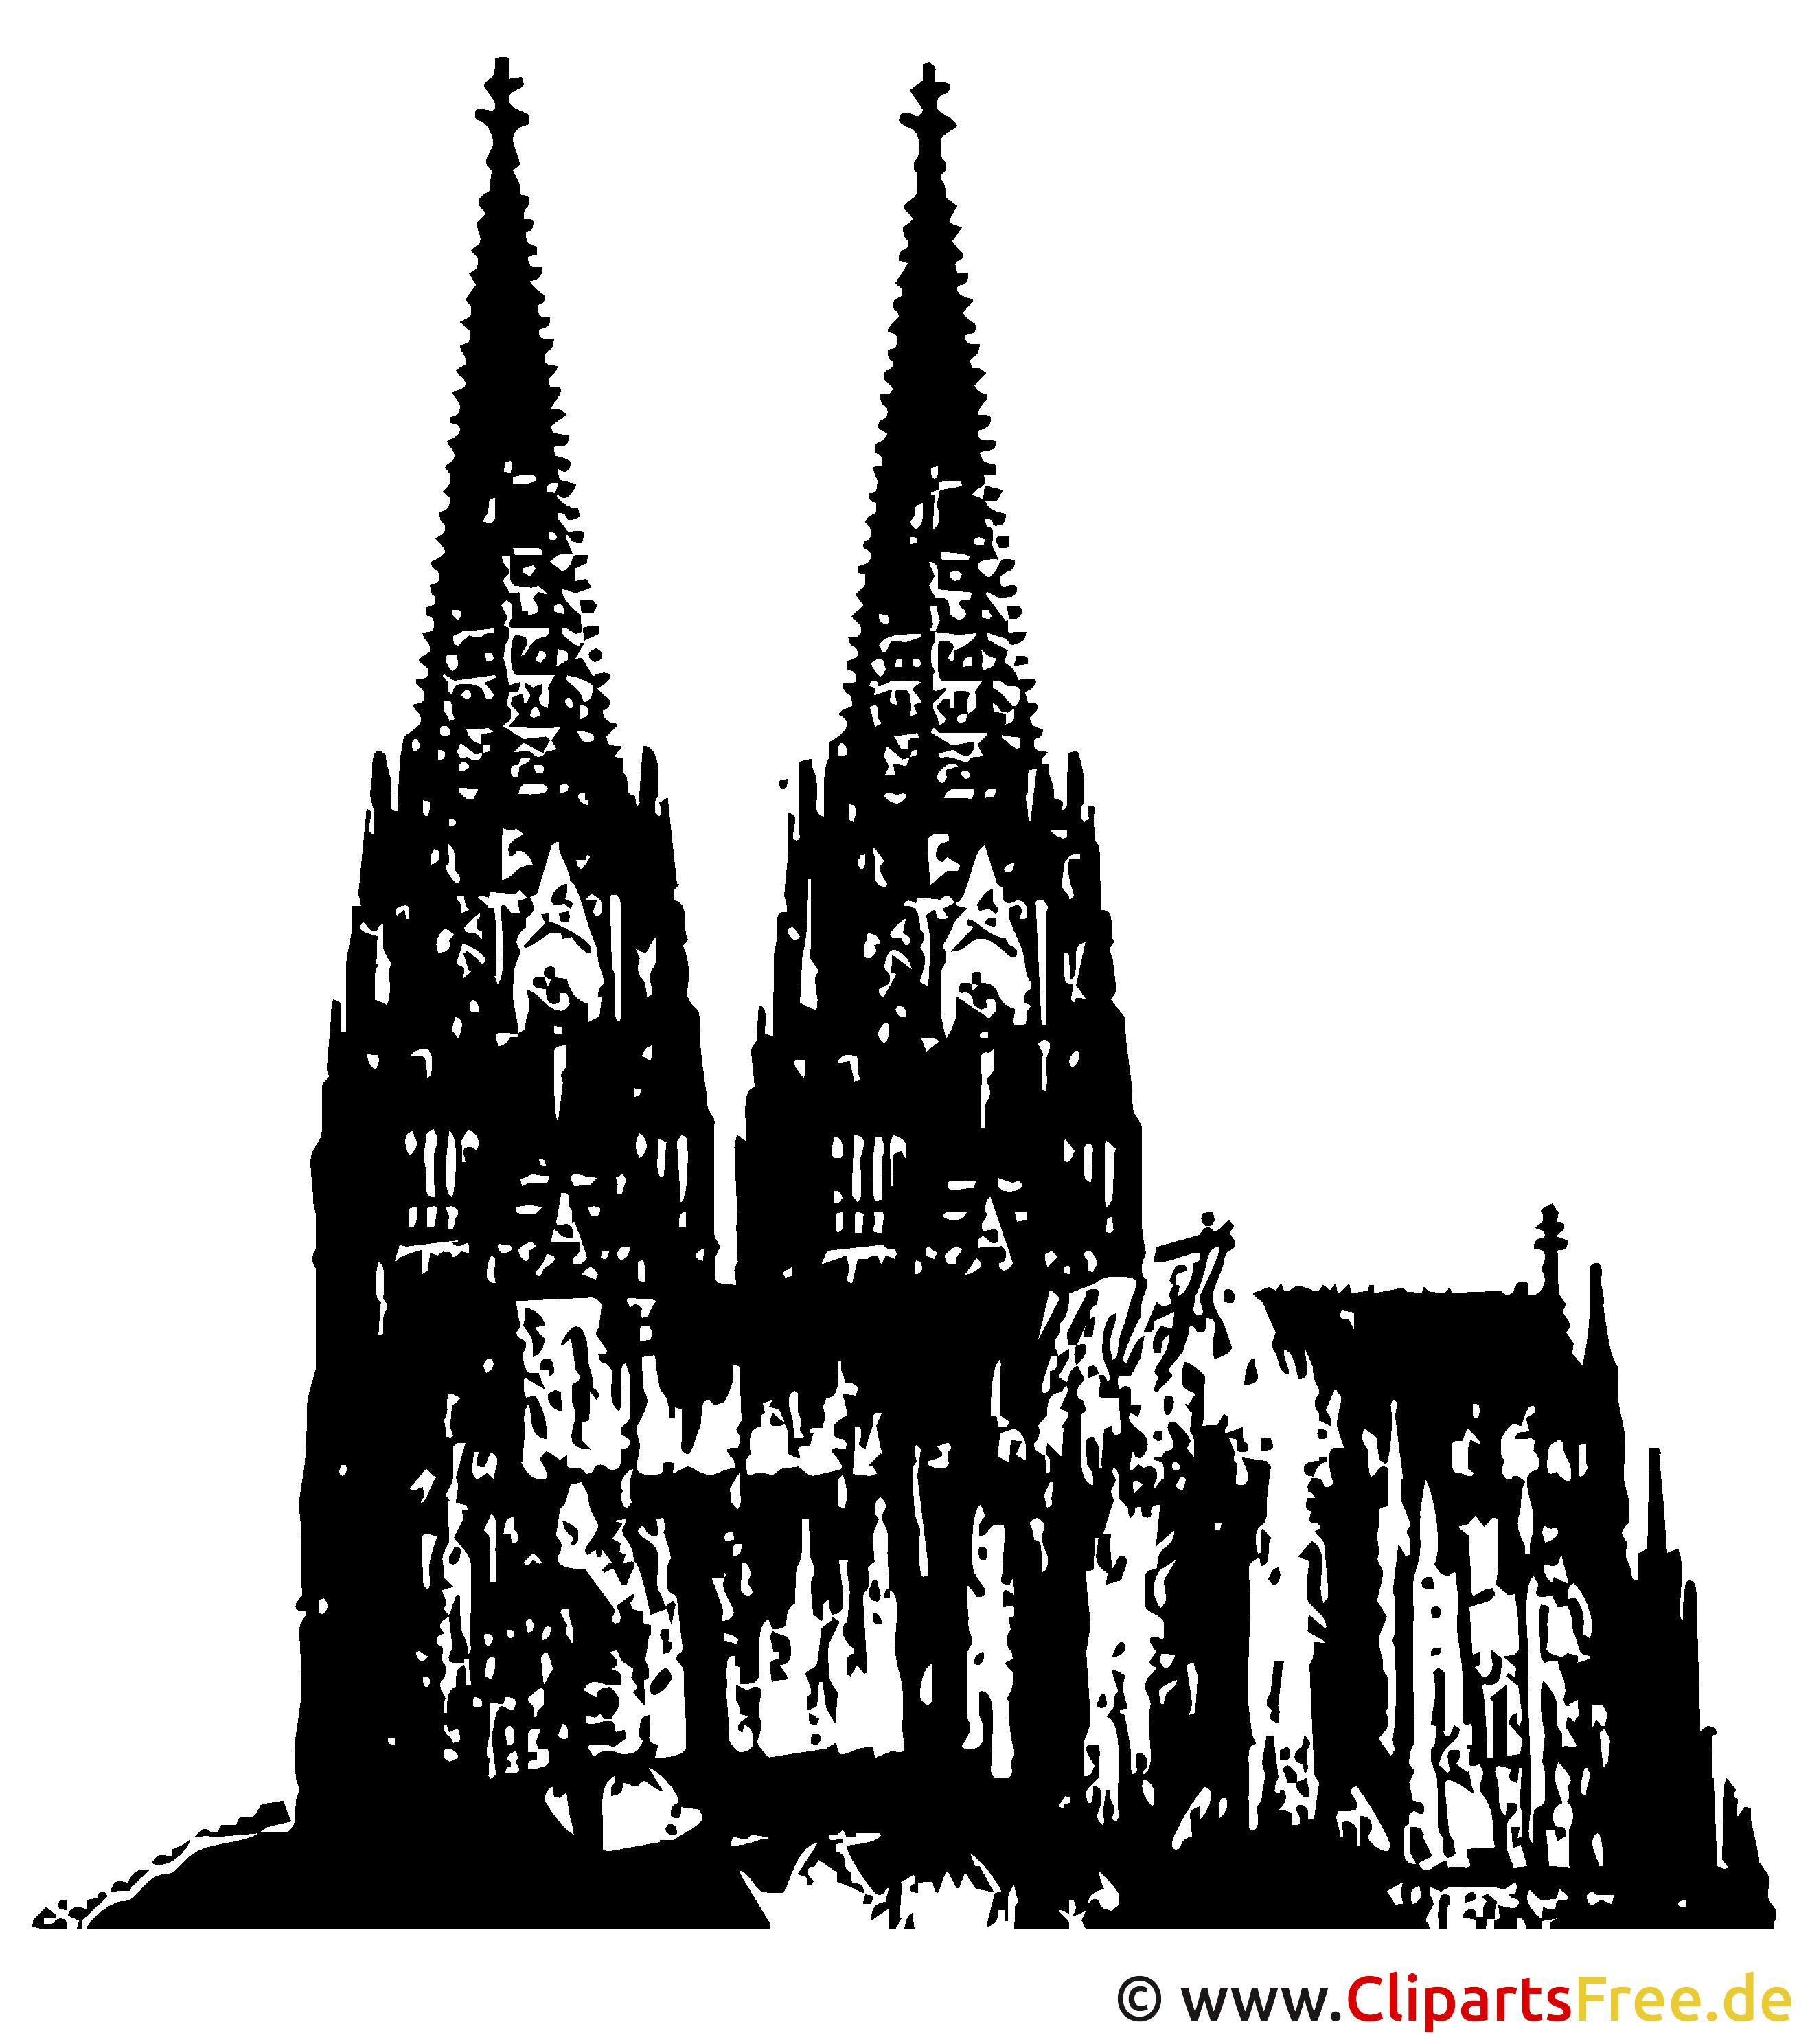 Köln Clipart-Illustration